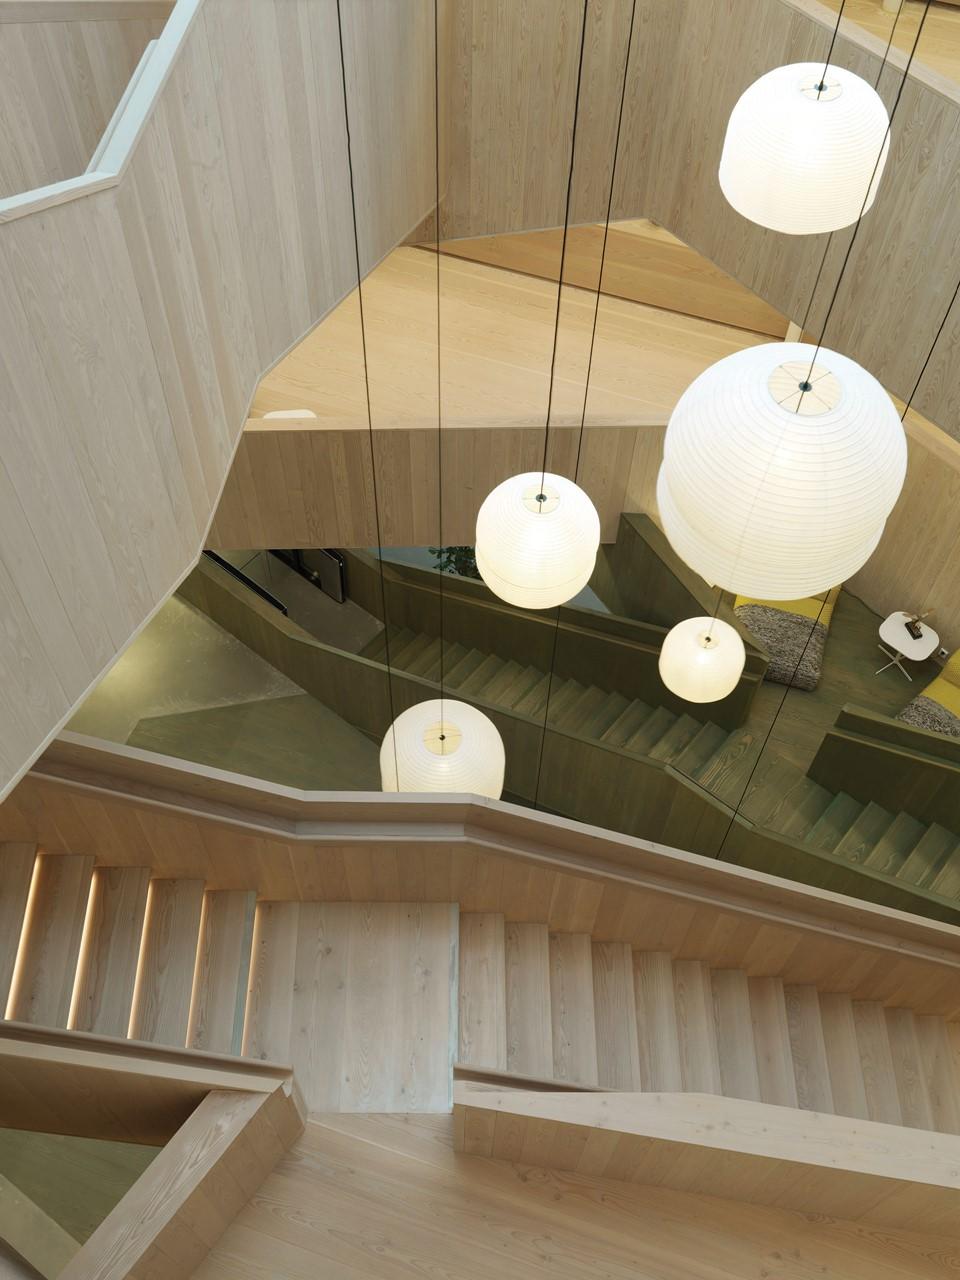 solid-douglas-flooring_lye-and-natural-oil_centiro-office-sweden_staircase_dinesen_01.jpg